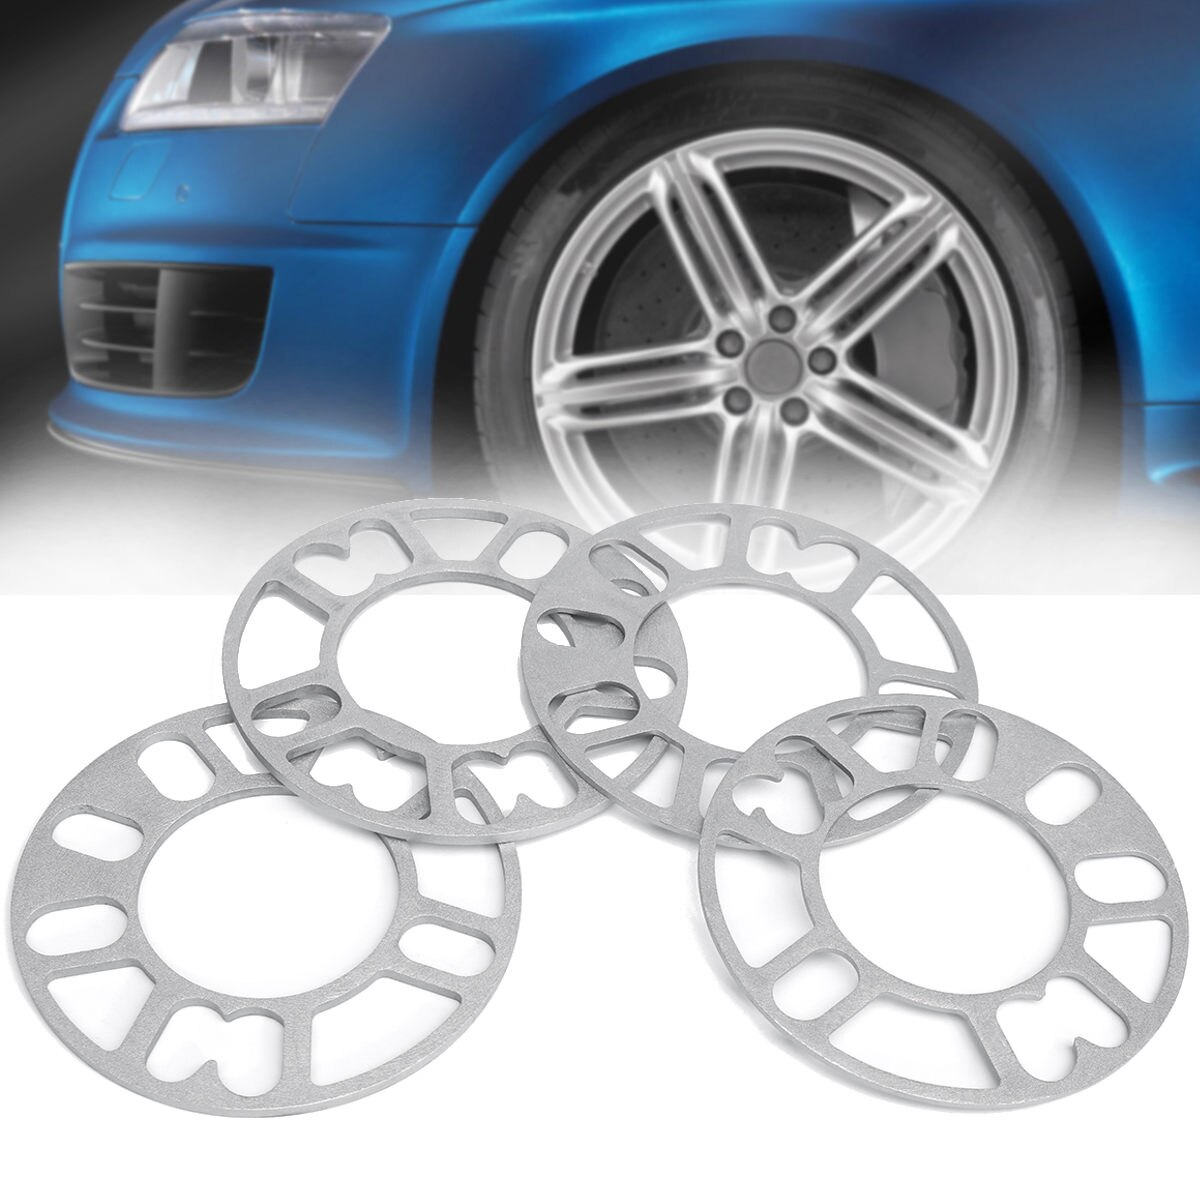 4pcs Car Wheel Spacer Shims Adjustable 4x98 4x100 4x108 4x114.3 5x100 5x105 5x108 5x112 5x114.3 5x120